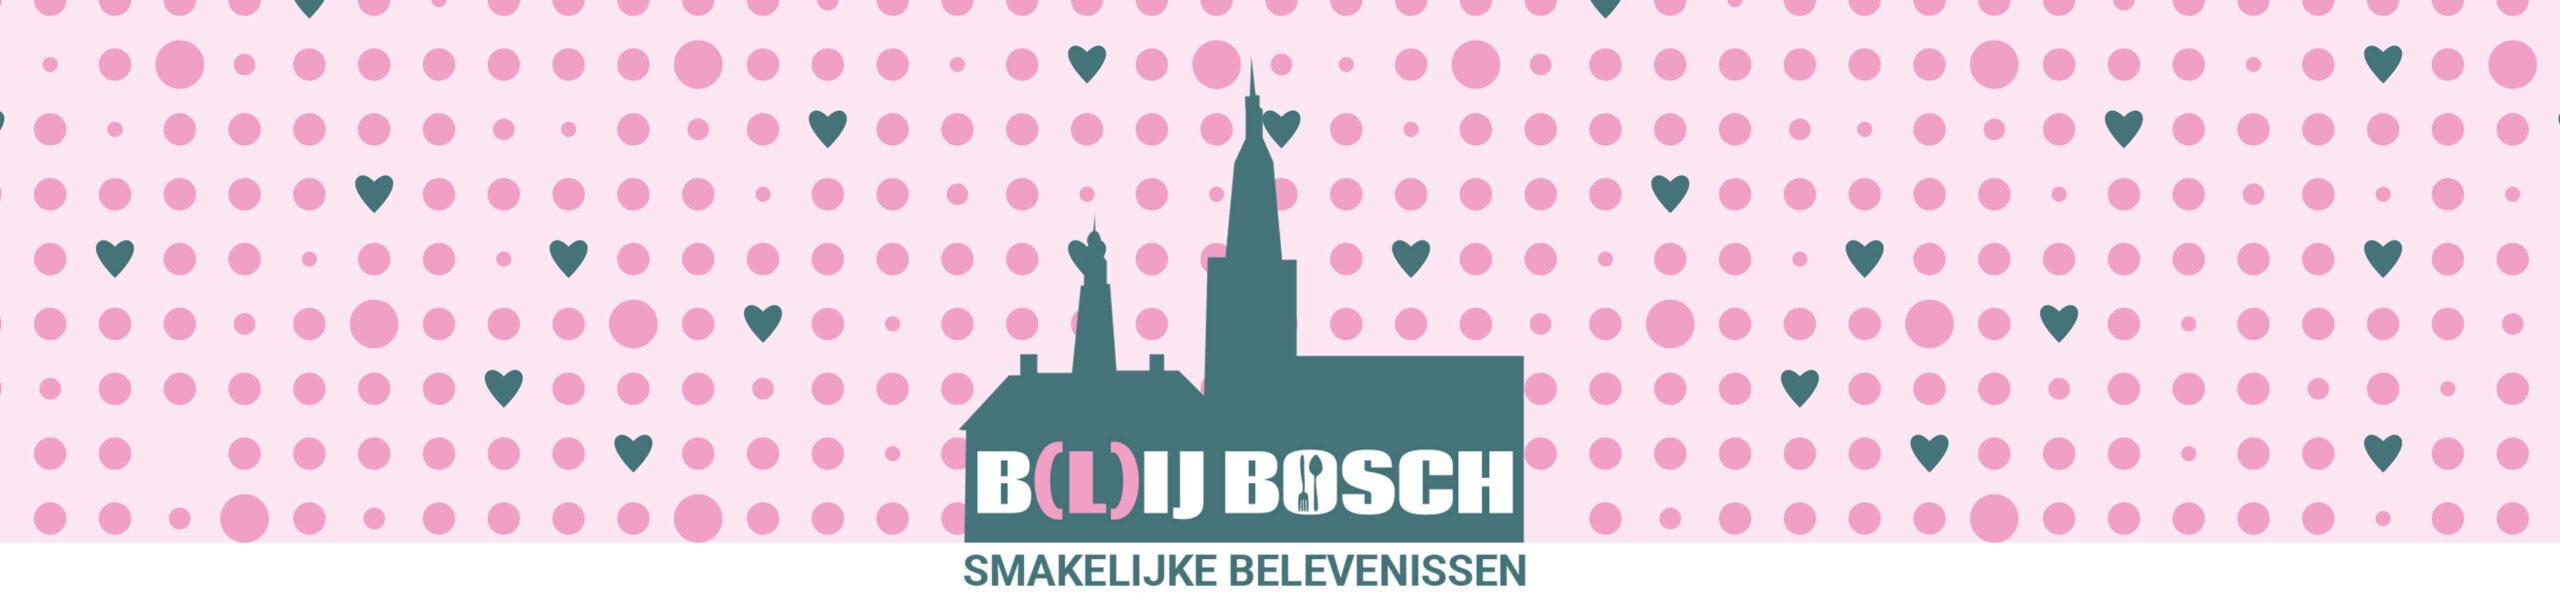 B(l)ij Bosch